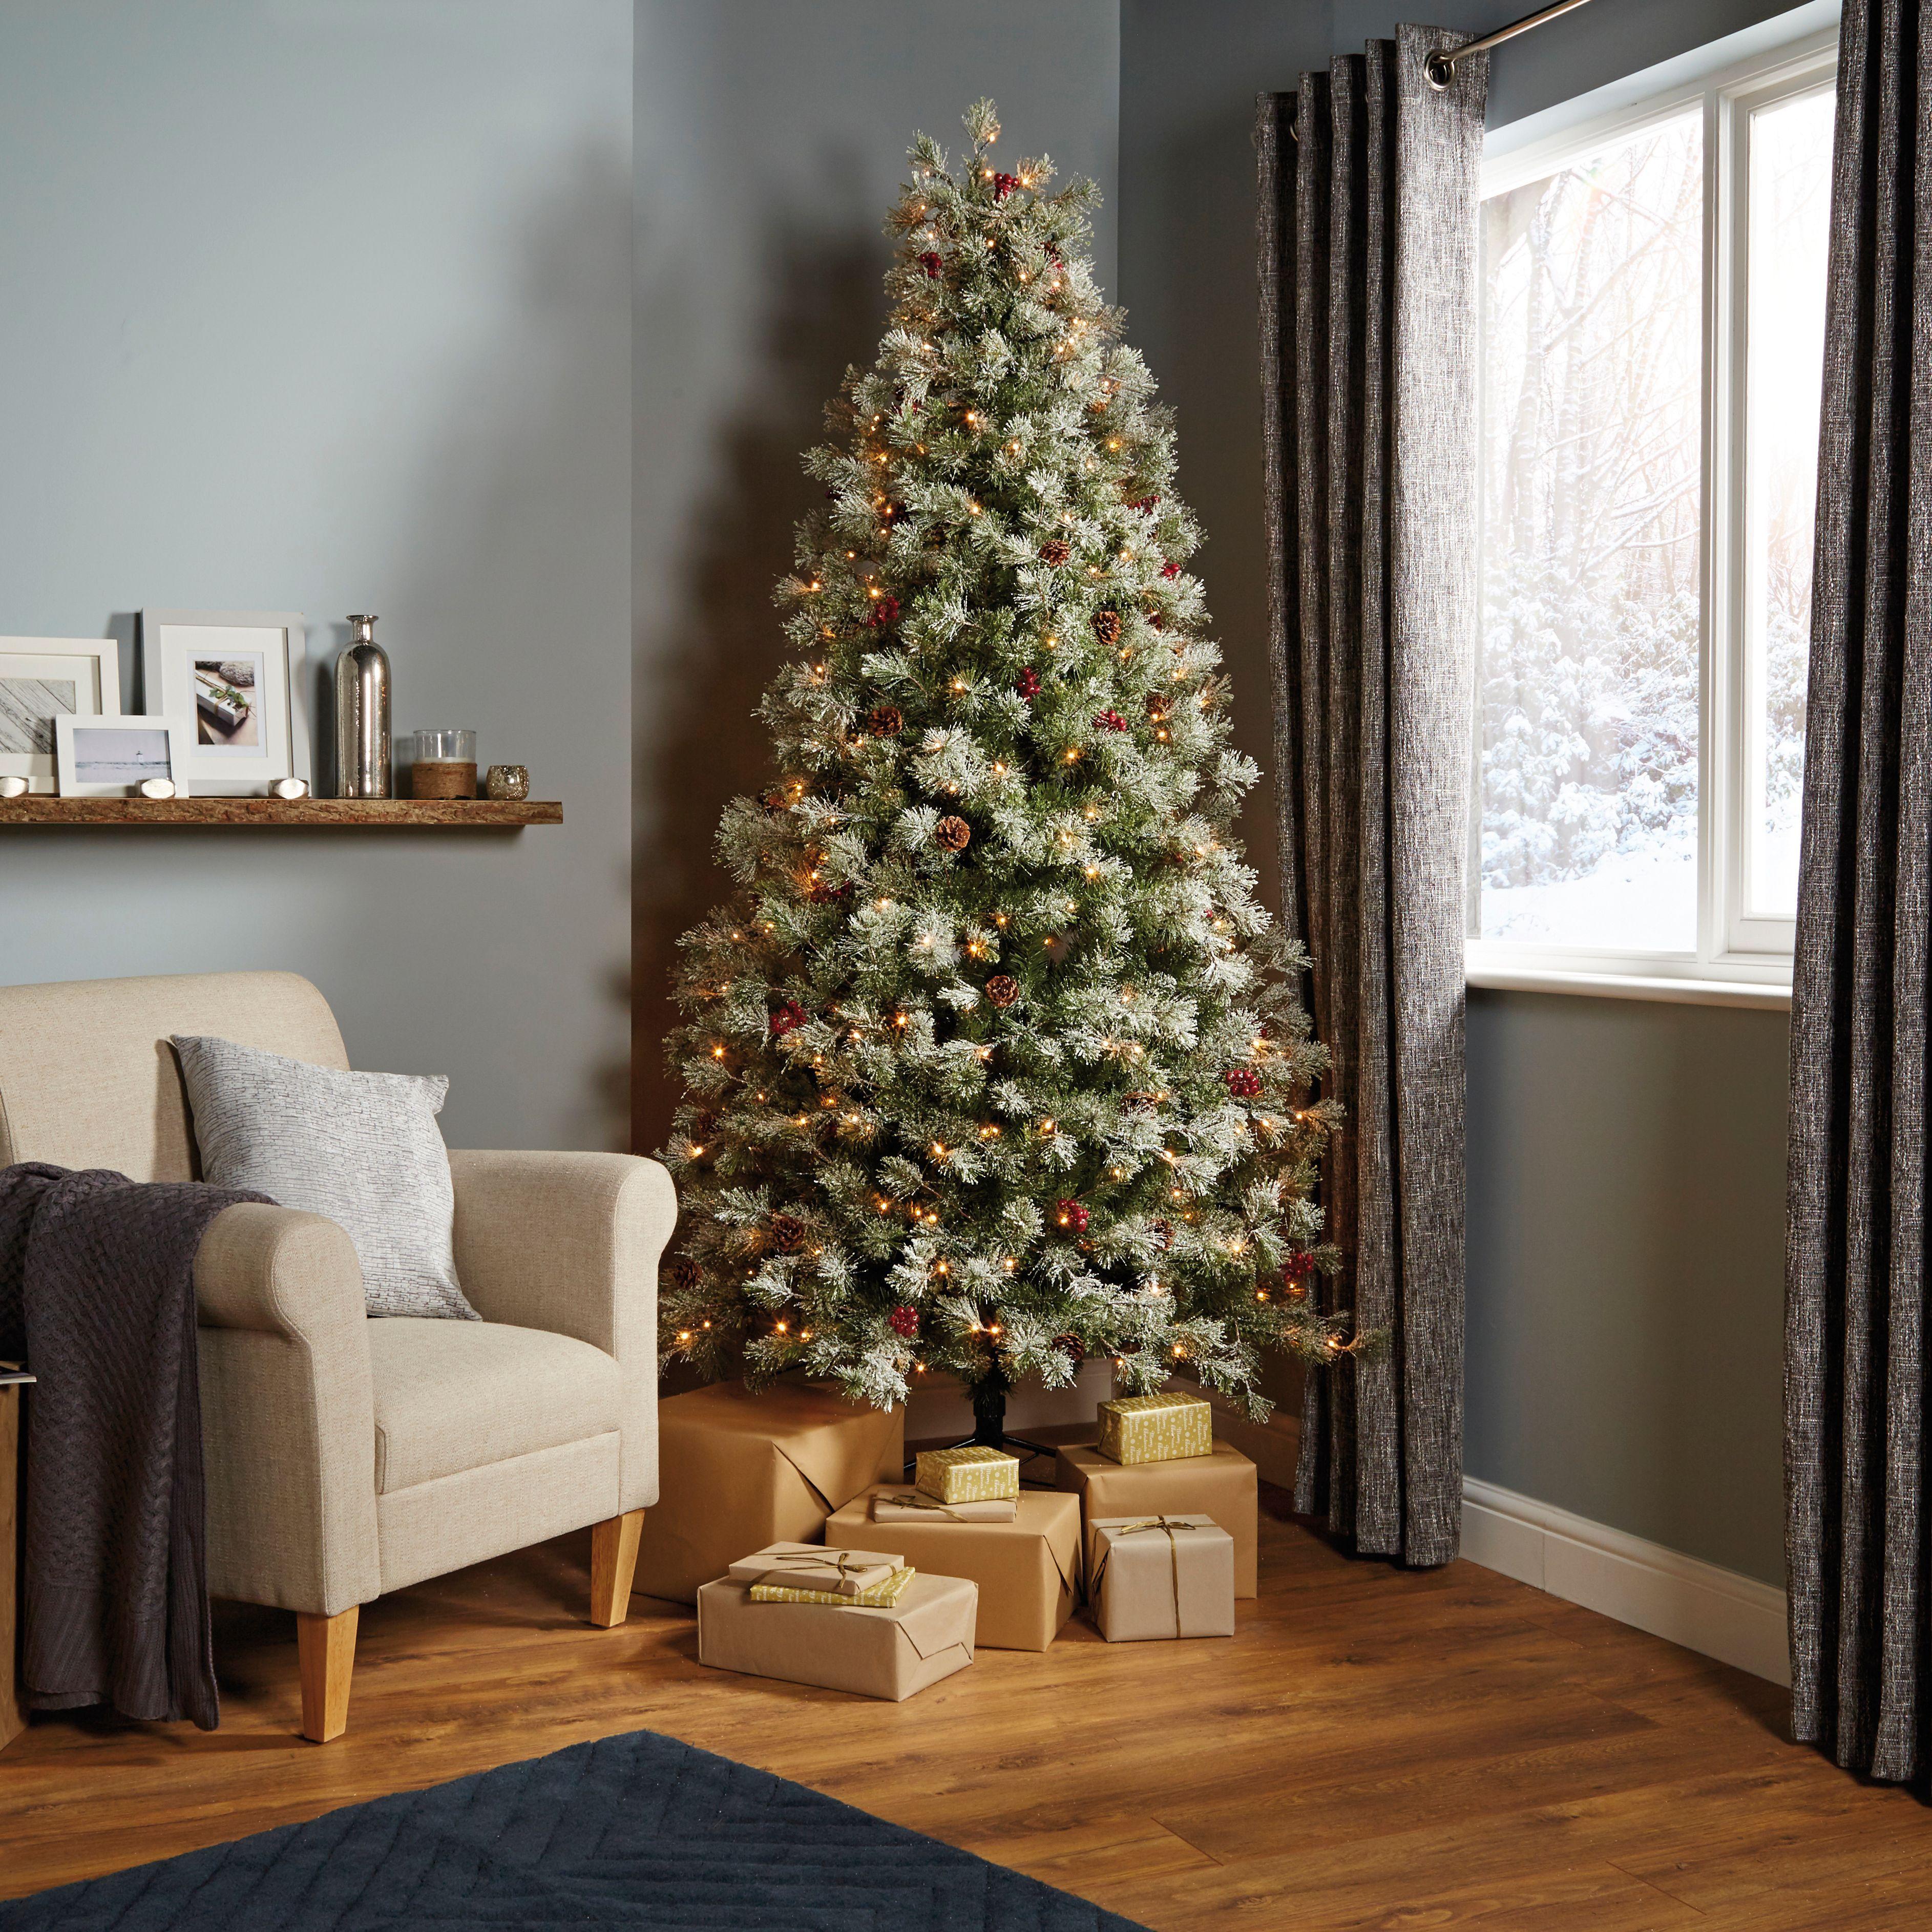 7ft 6In Fairview Pre-Lit LED Christmas Tree